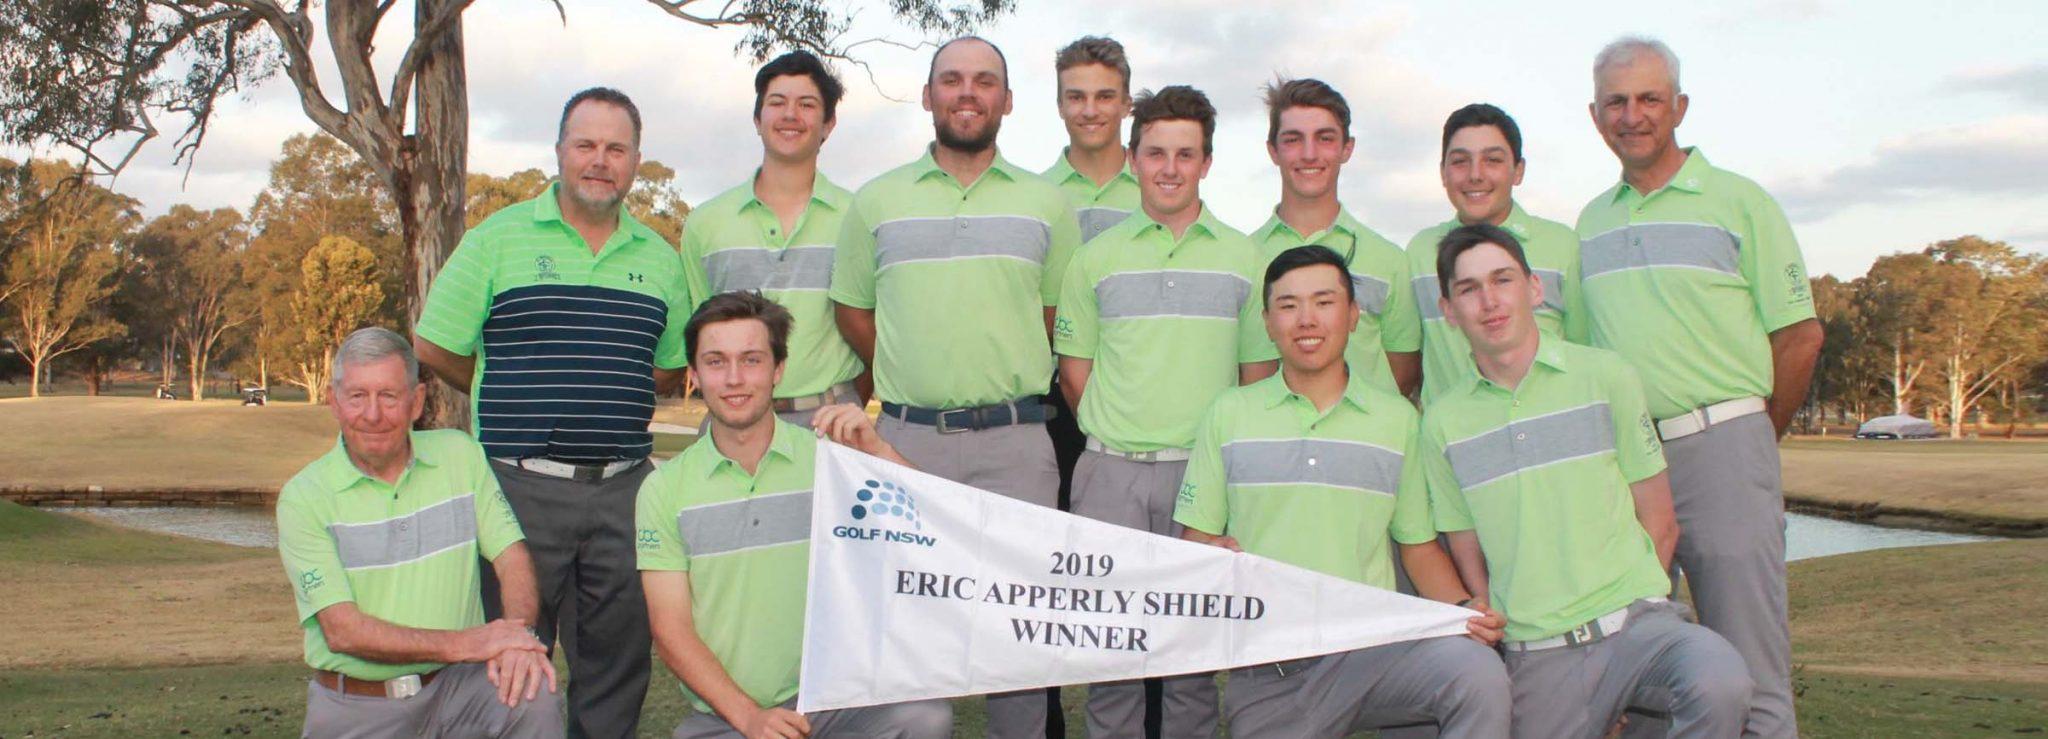 2019 Eric Apperly Shield Winners St Michael's Golf Club